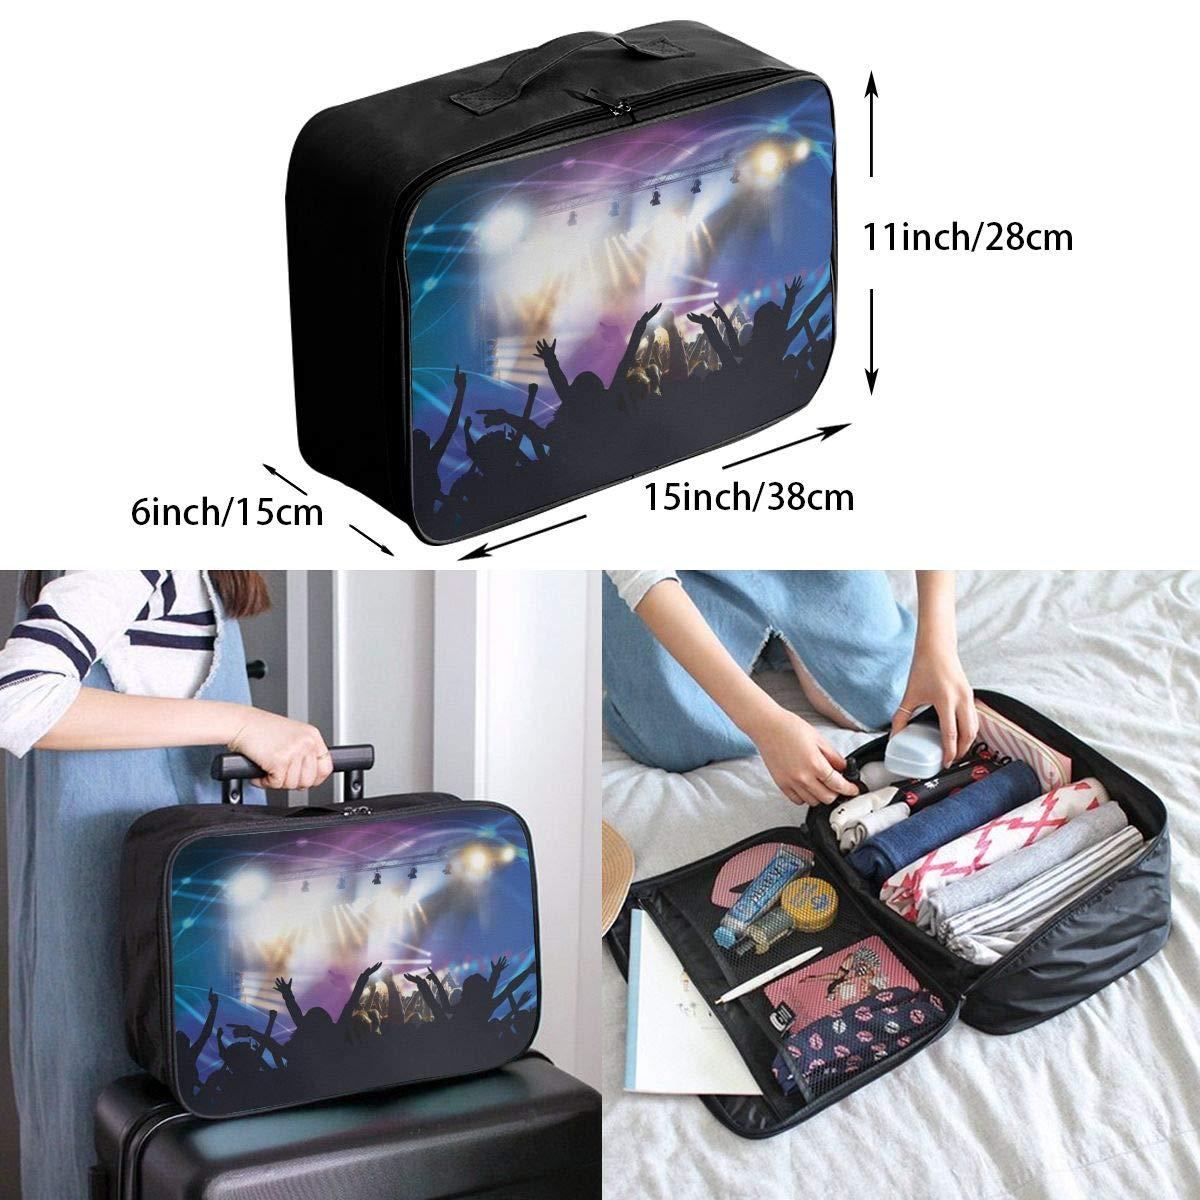 Travel Luggage Duffle Bag Lightweight Portable Handbag Dance Music Large Capacity Waterproof Foldable Storage Tote